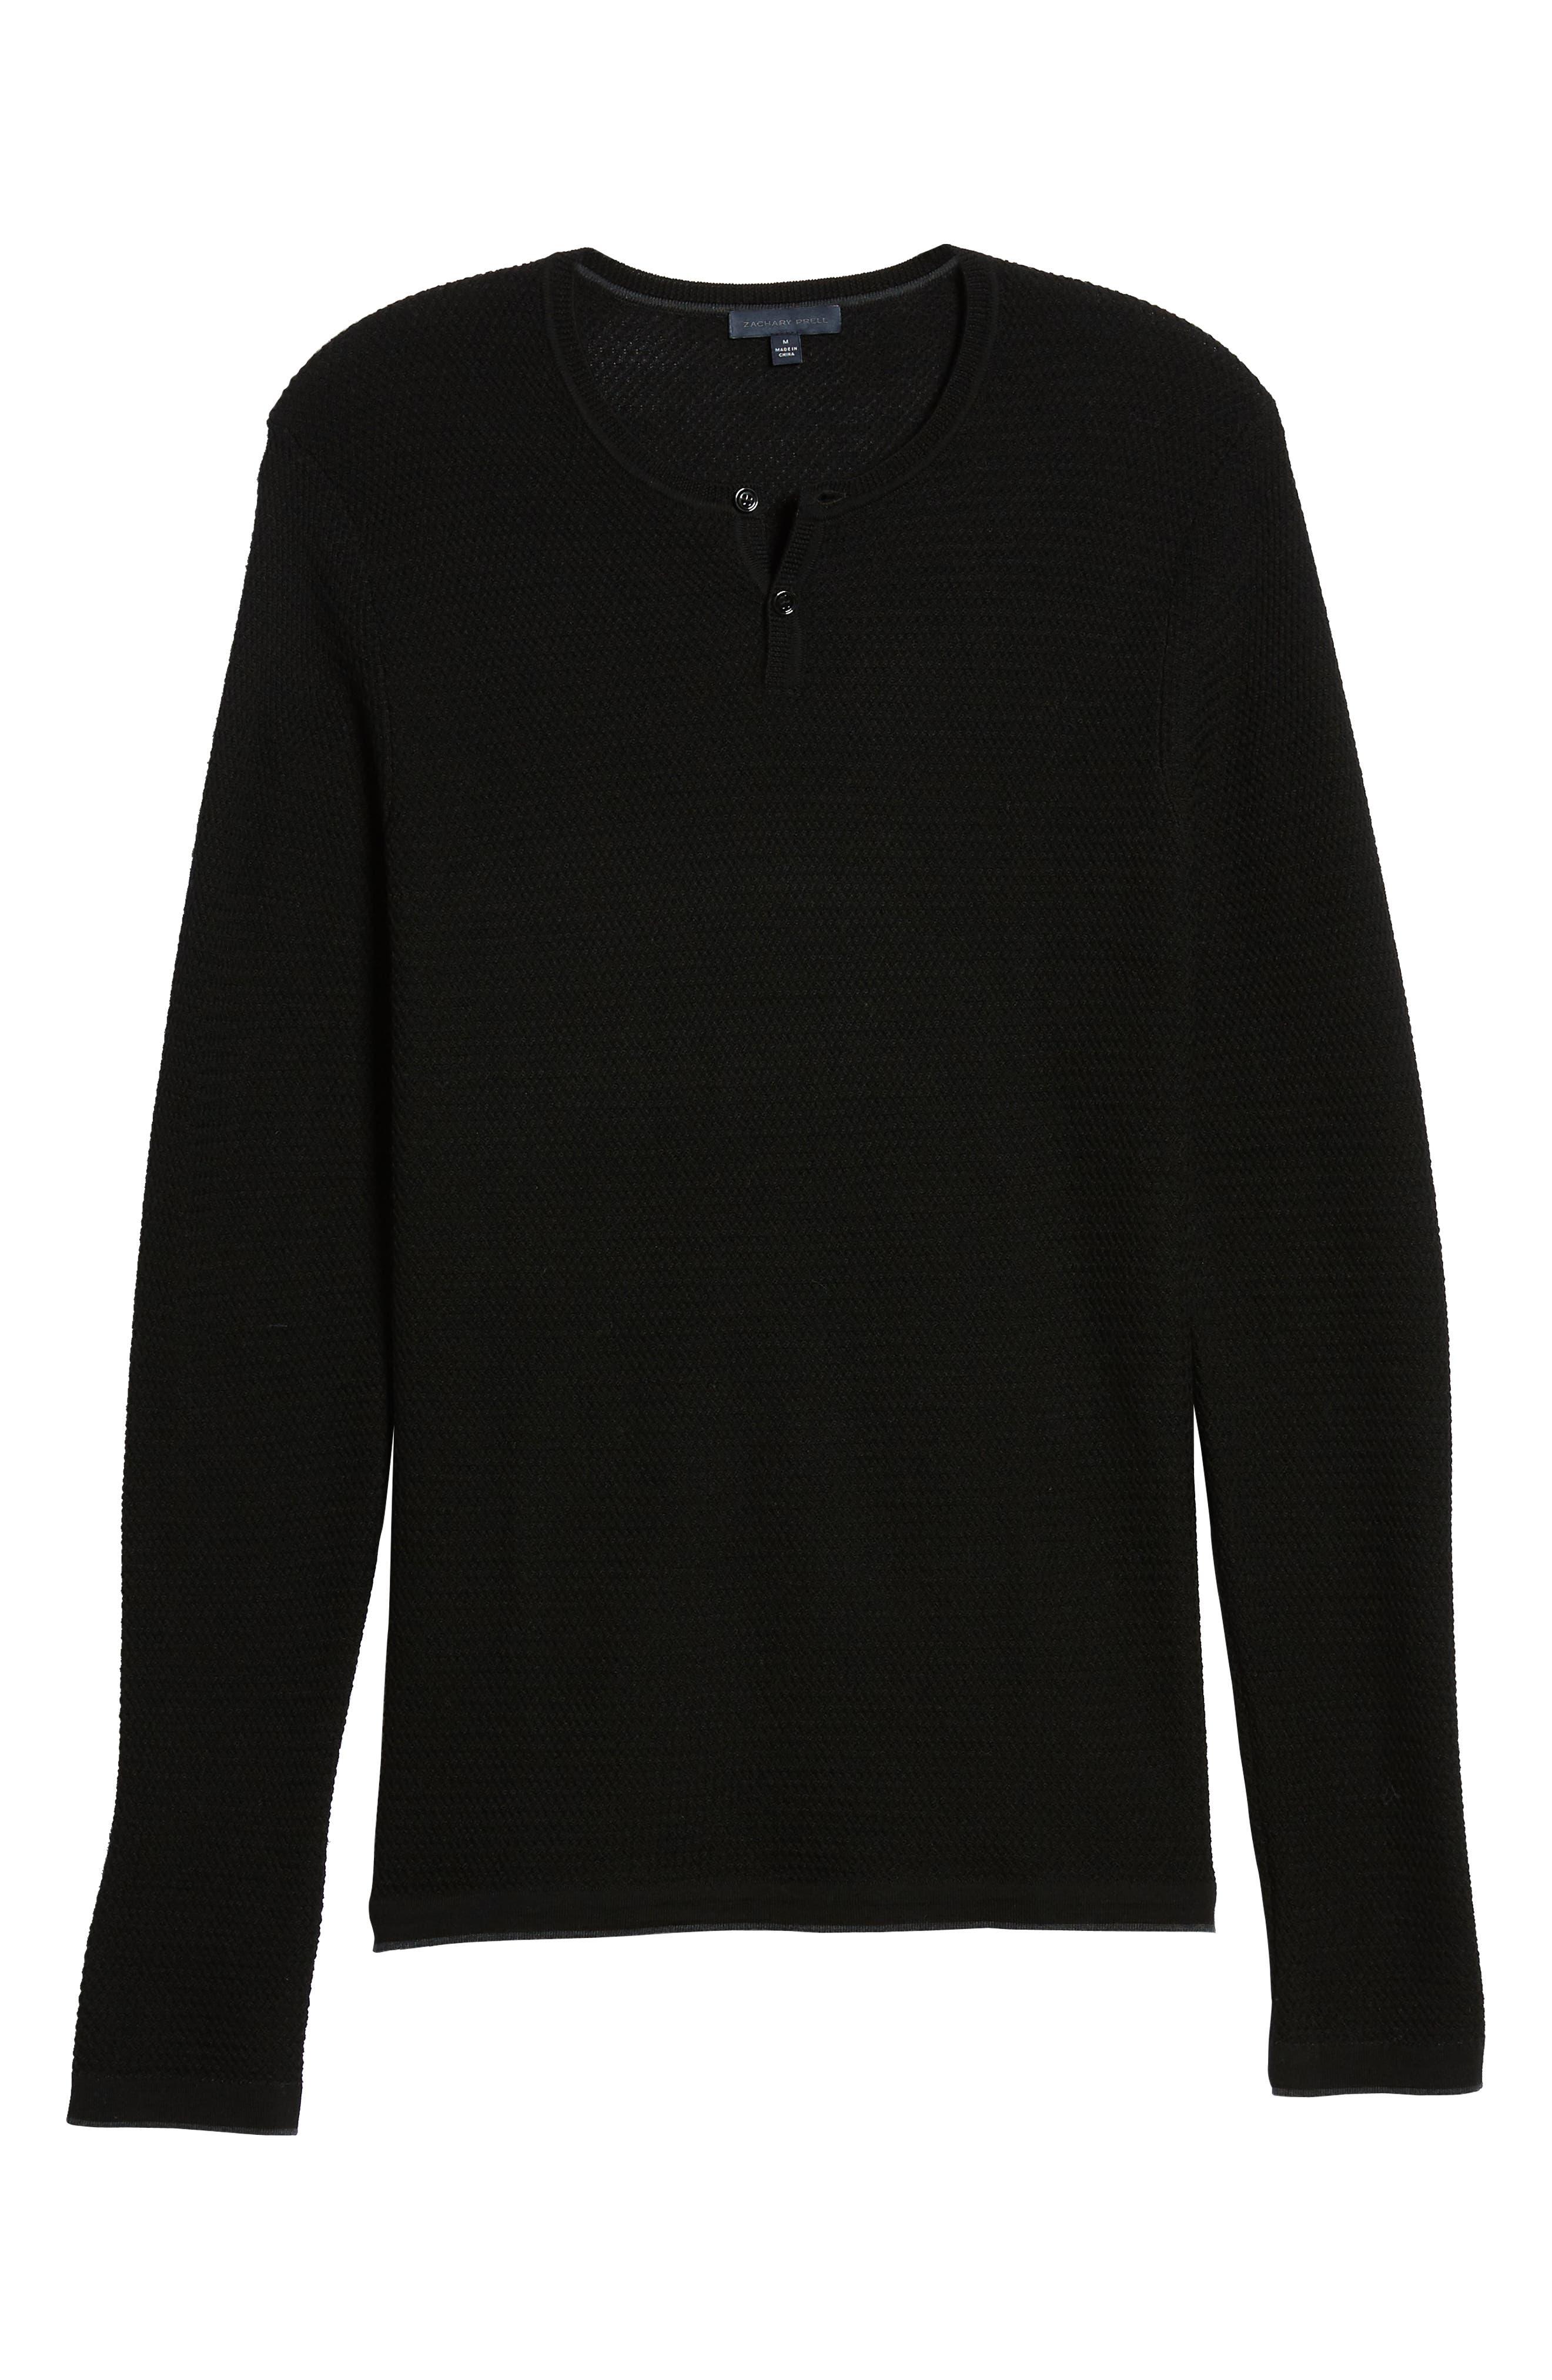 Hawthorn Wool Blend Thermal,                             Alternate thumbnail 6, color,                             BLACK